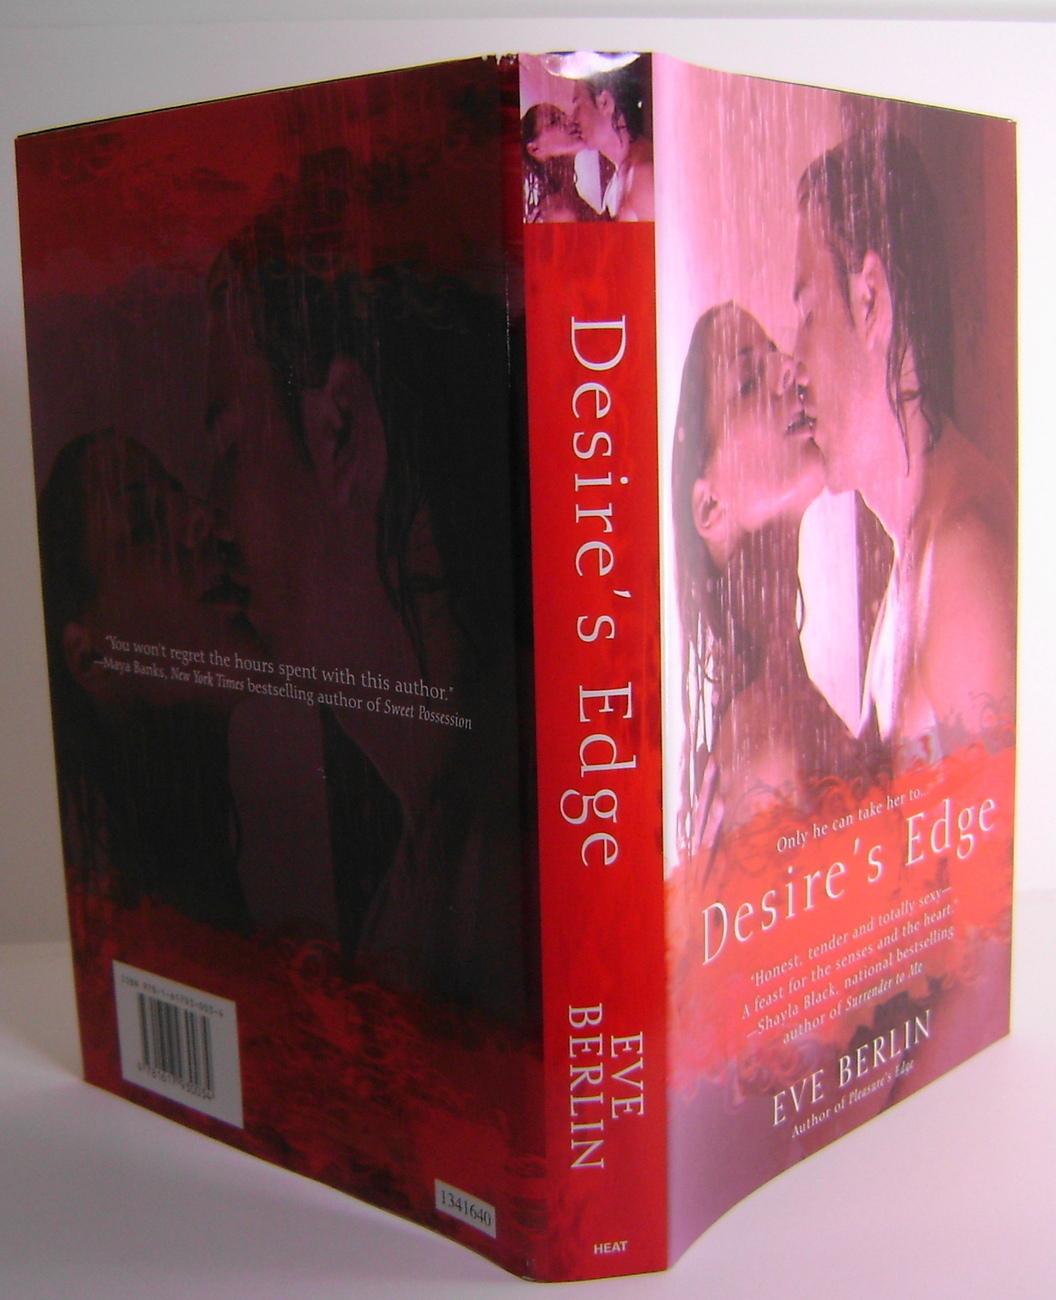 Desires Edge By Eve Berlin Erotica Romance BCE HC